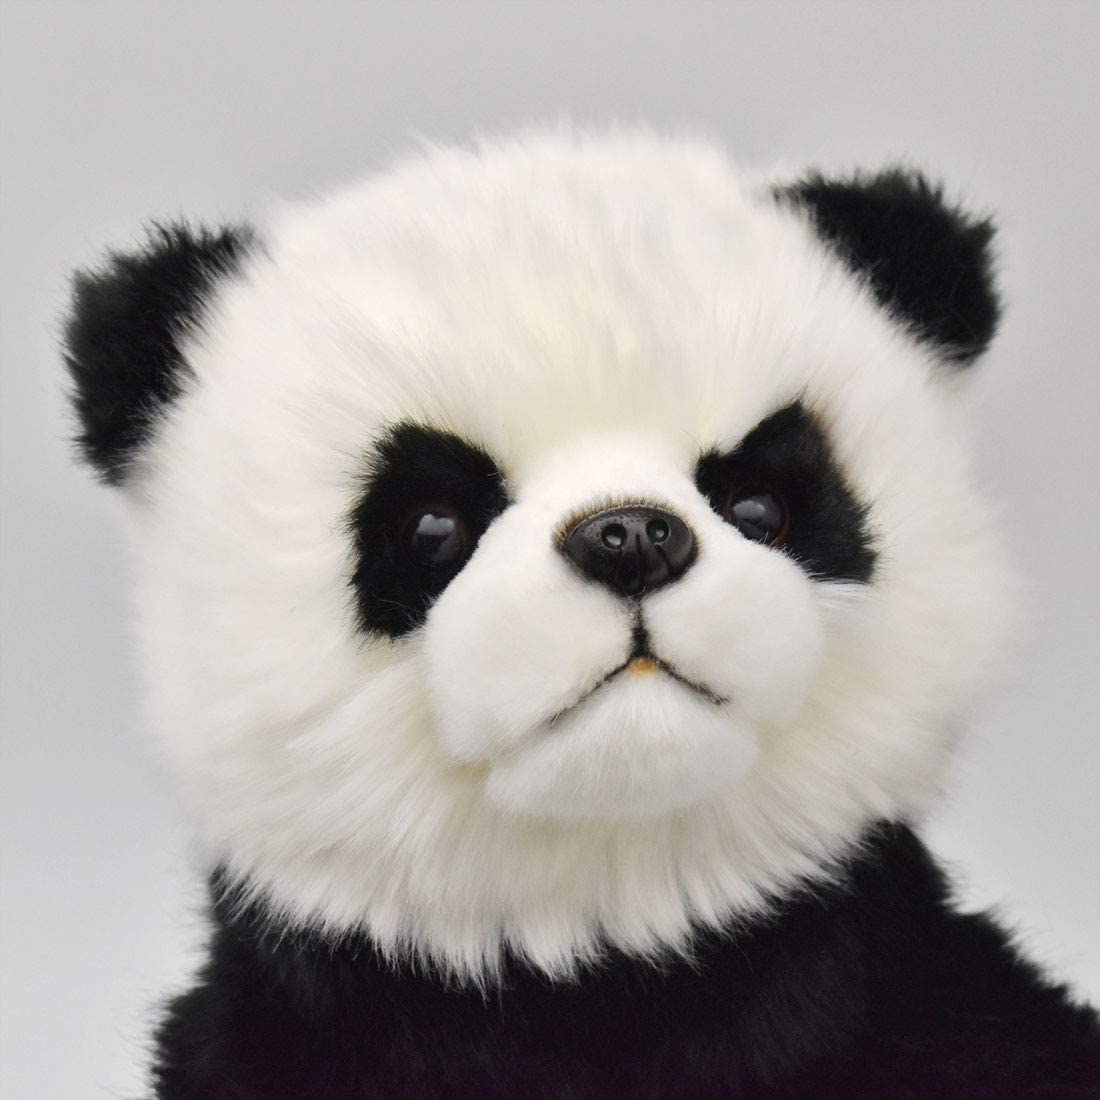 Handpuppe Panda originalgetreu 30cm PandabärTheaterpuppe Hansa 7165 Kopf im detail